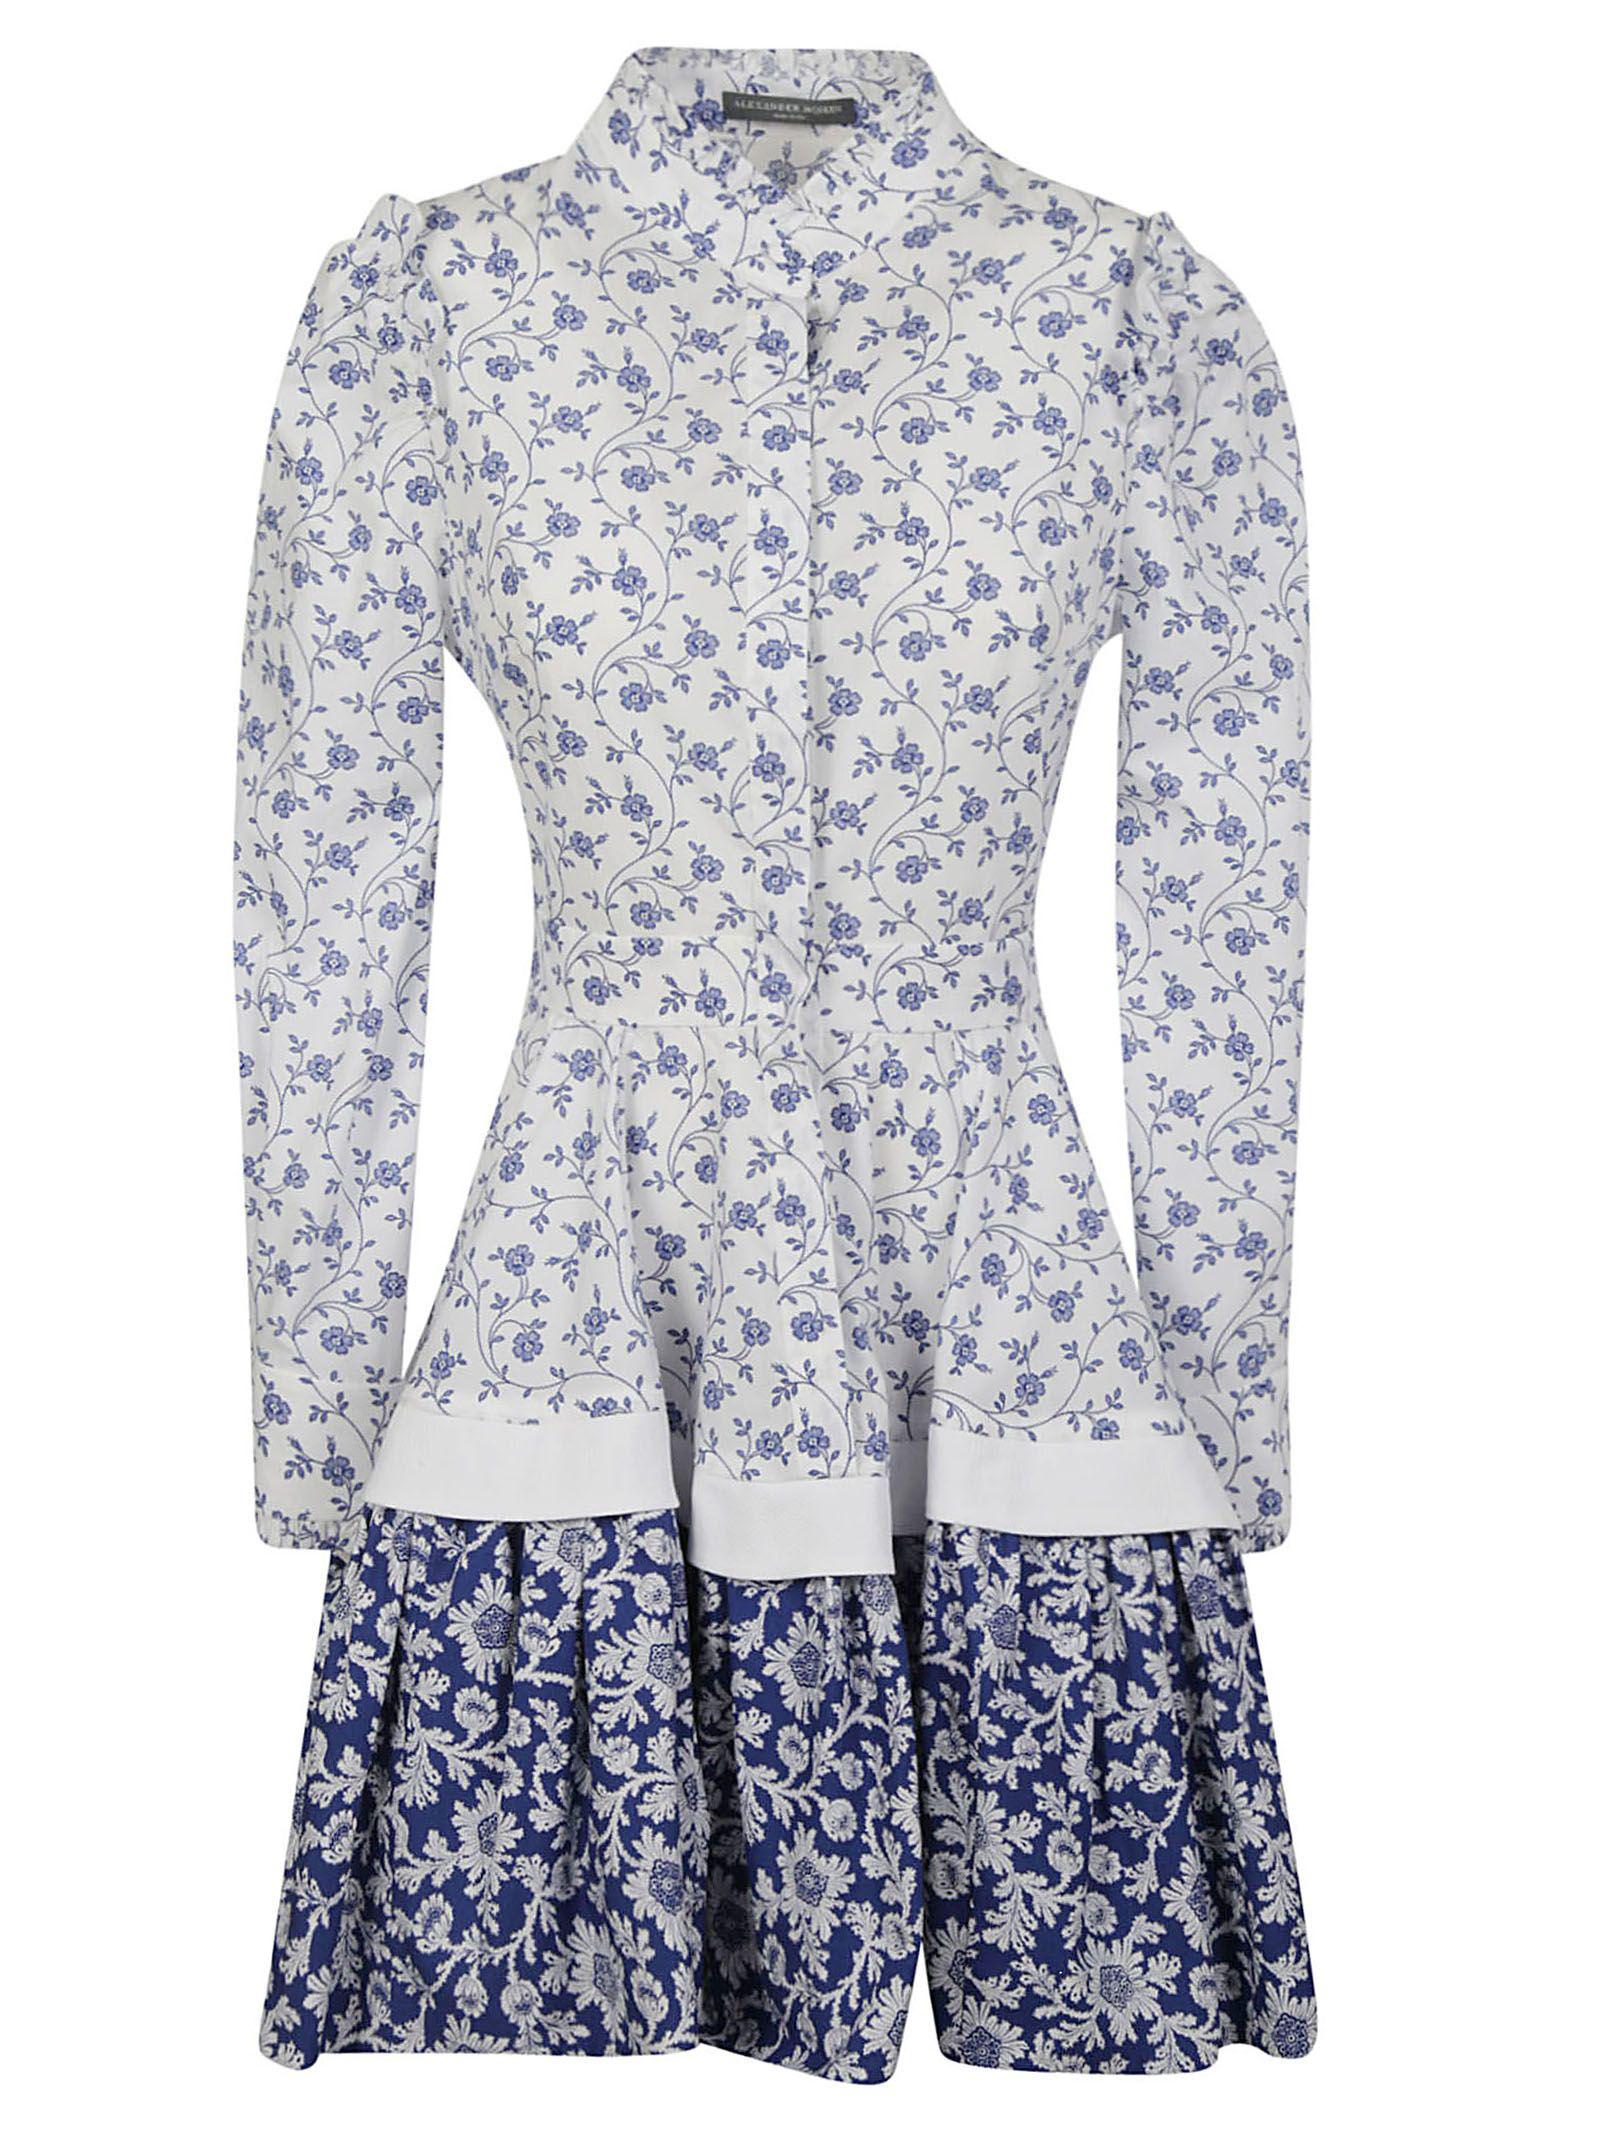 Alexander Mcqueen Floral Print Skater Dress in Basic